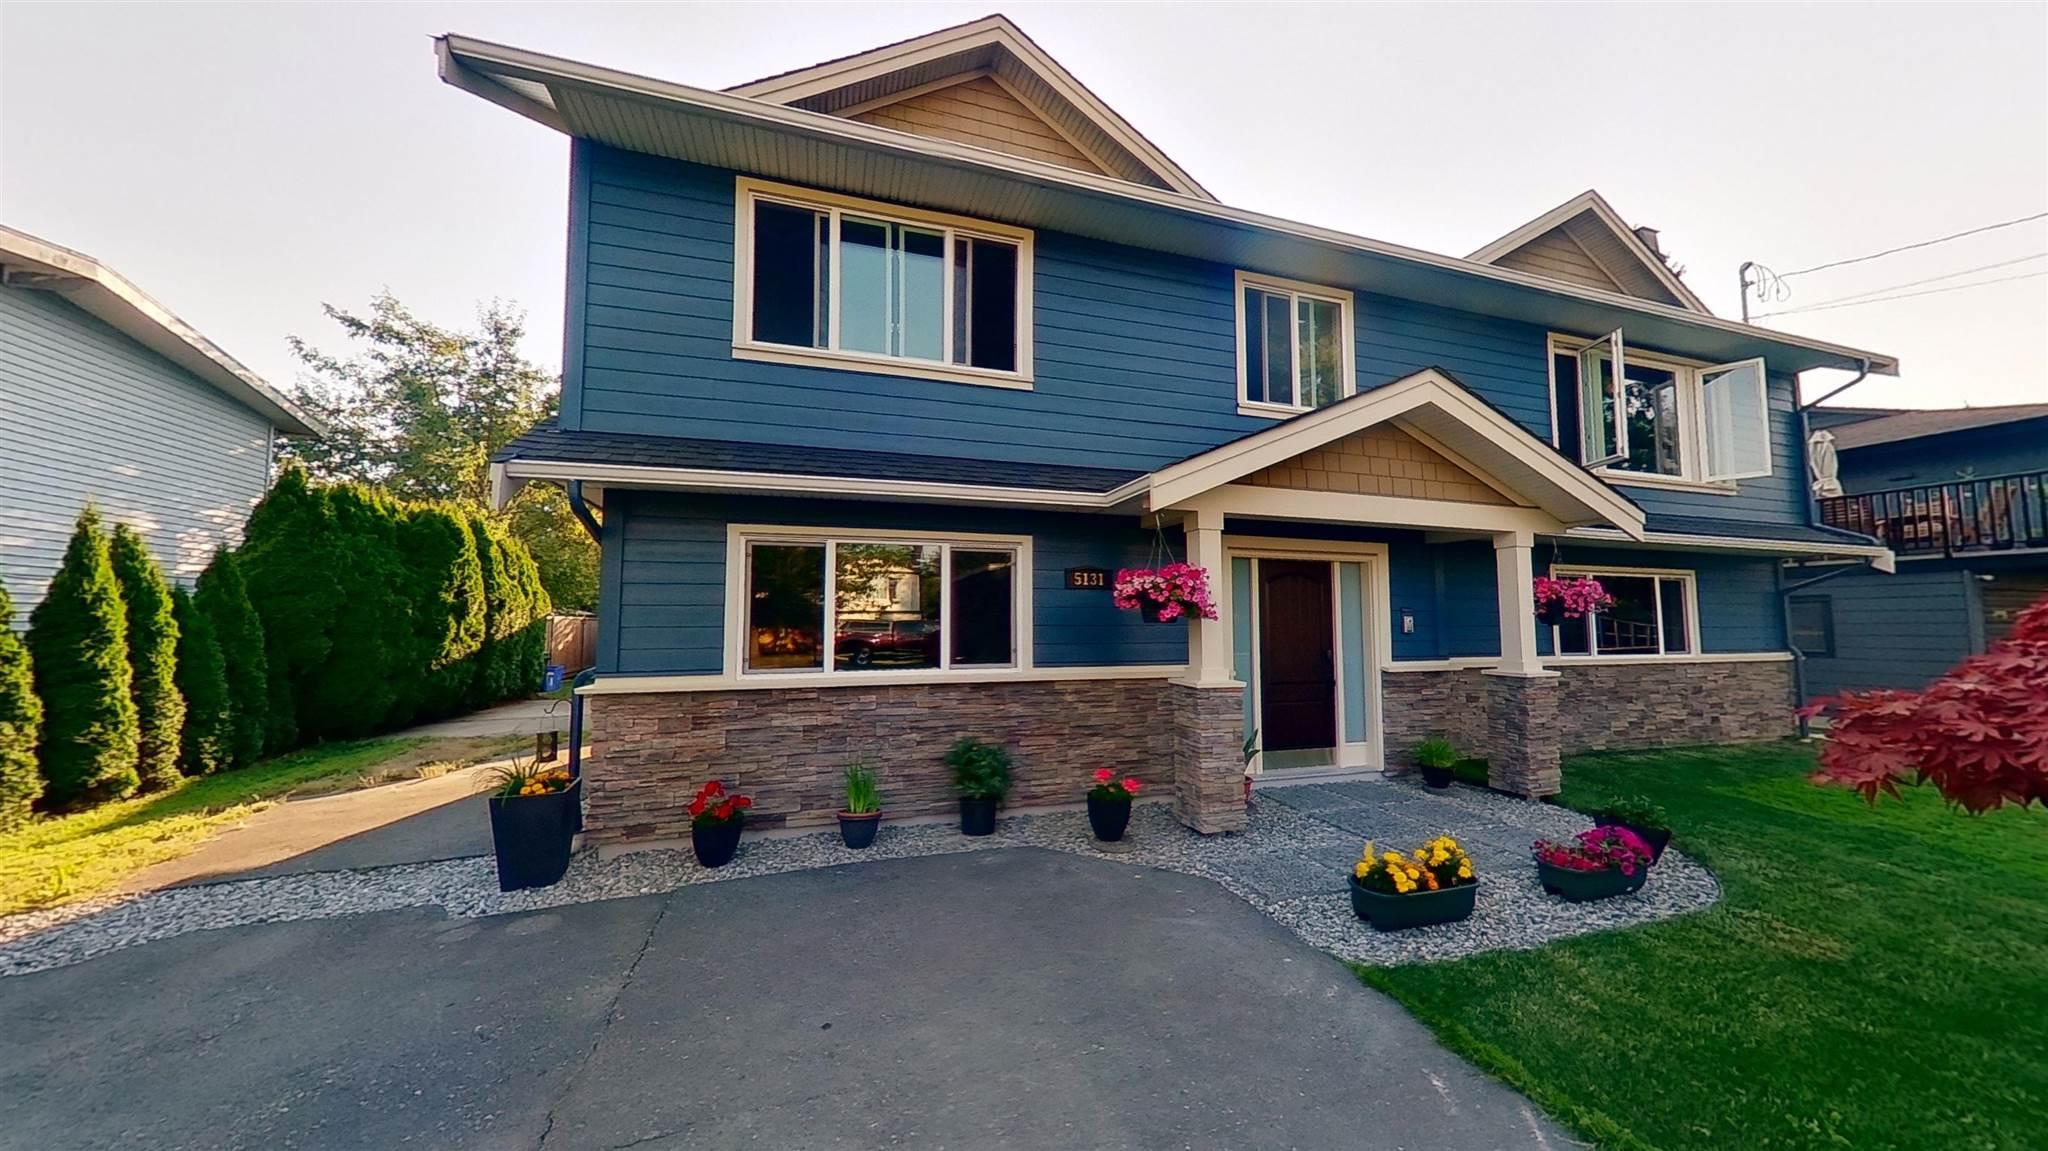 5131 58B STREET - Hawthorne House/Single Family for sale, 4 Bedrooms (R2597877)